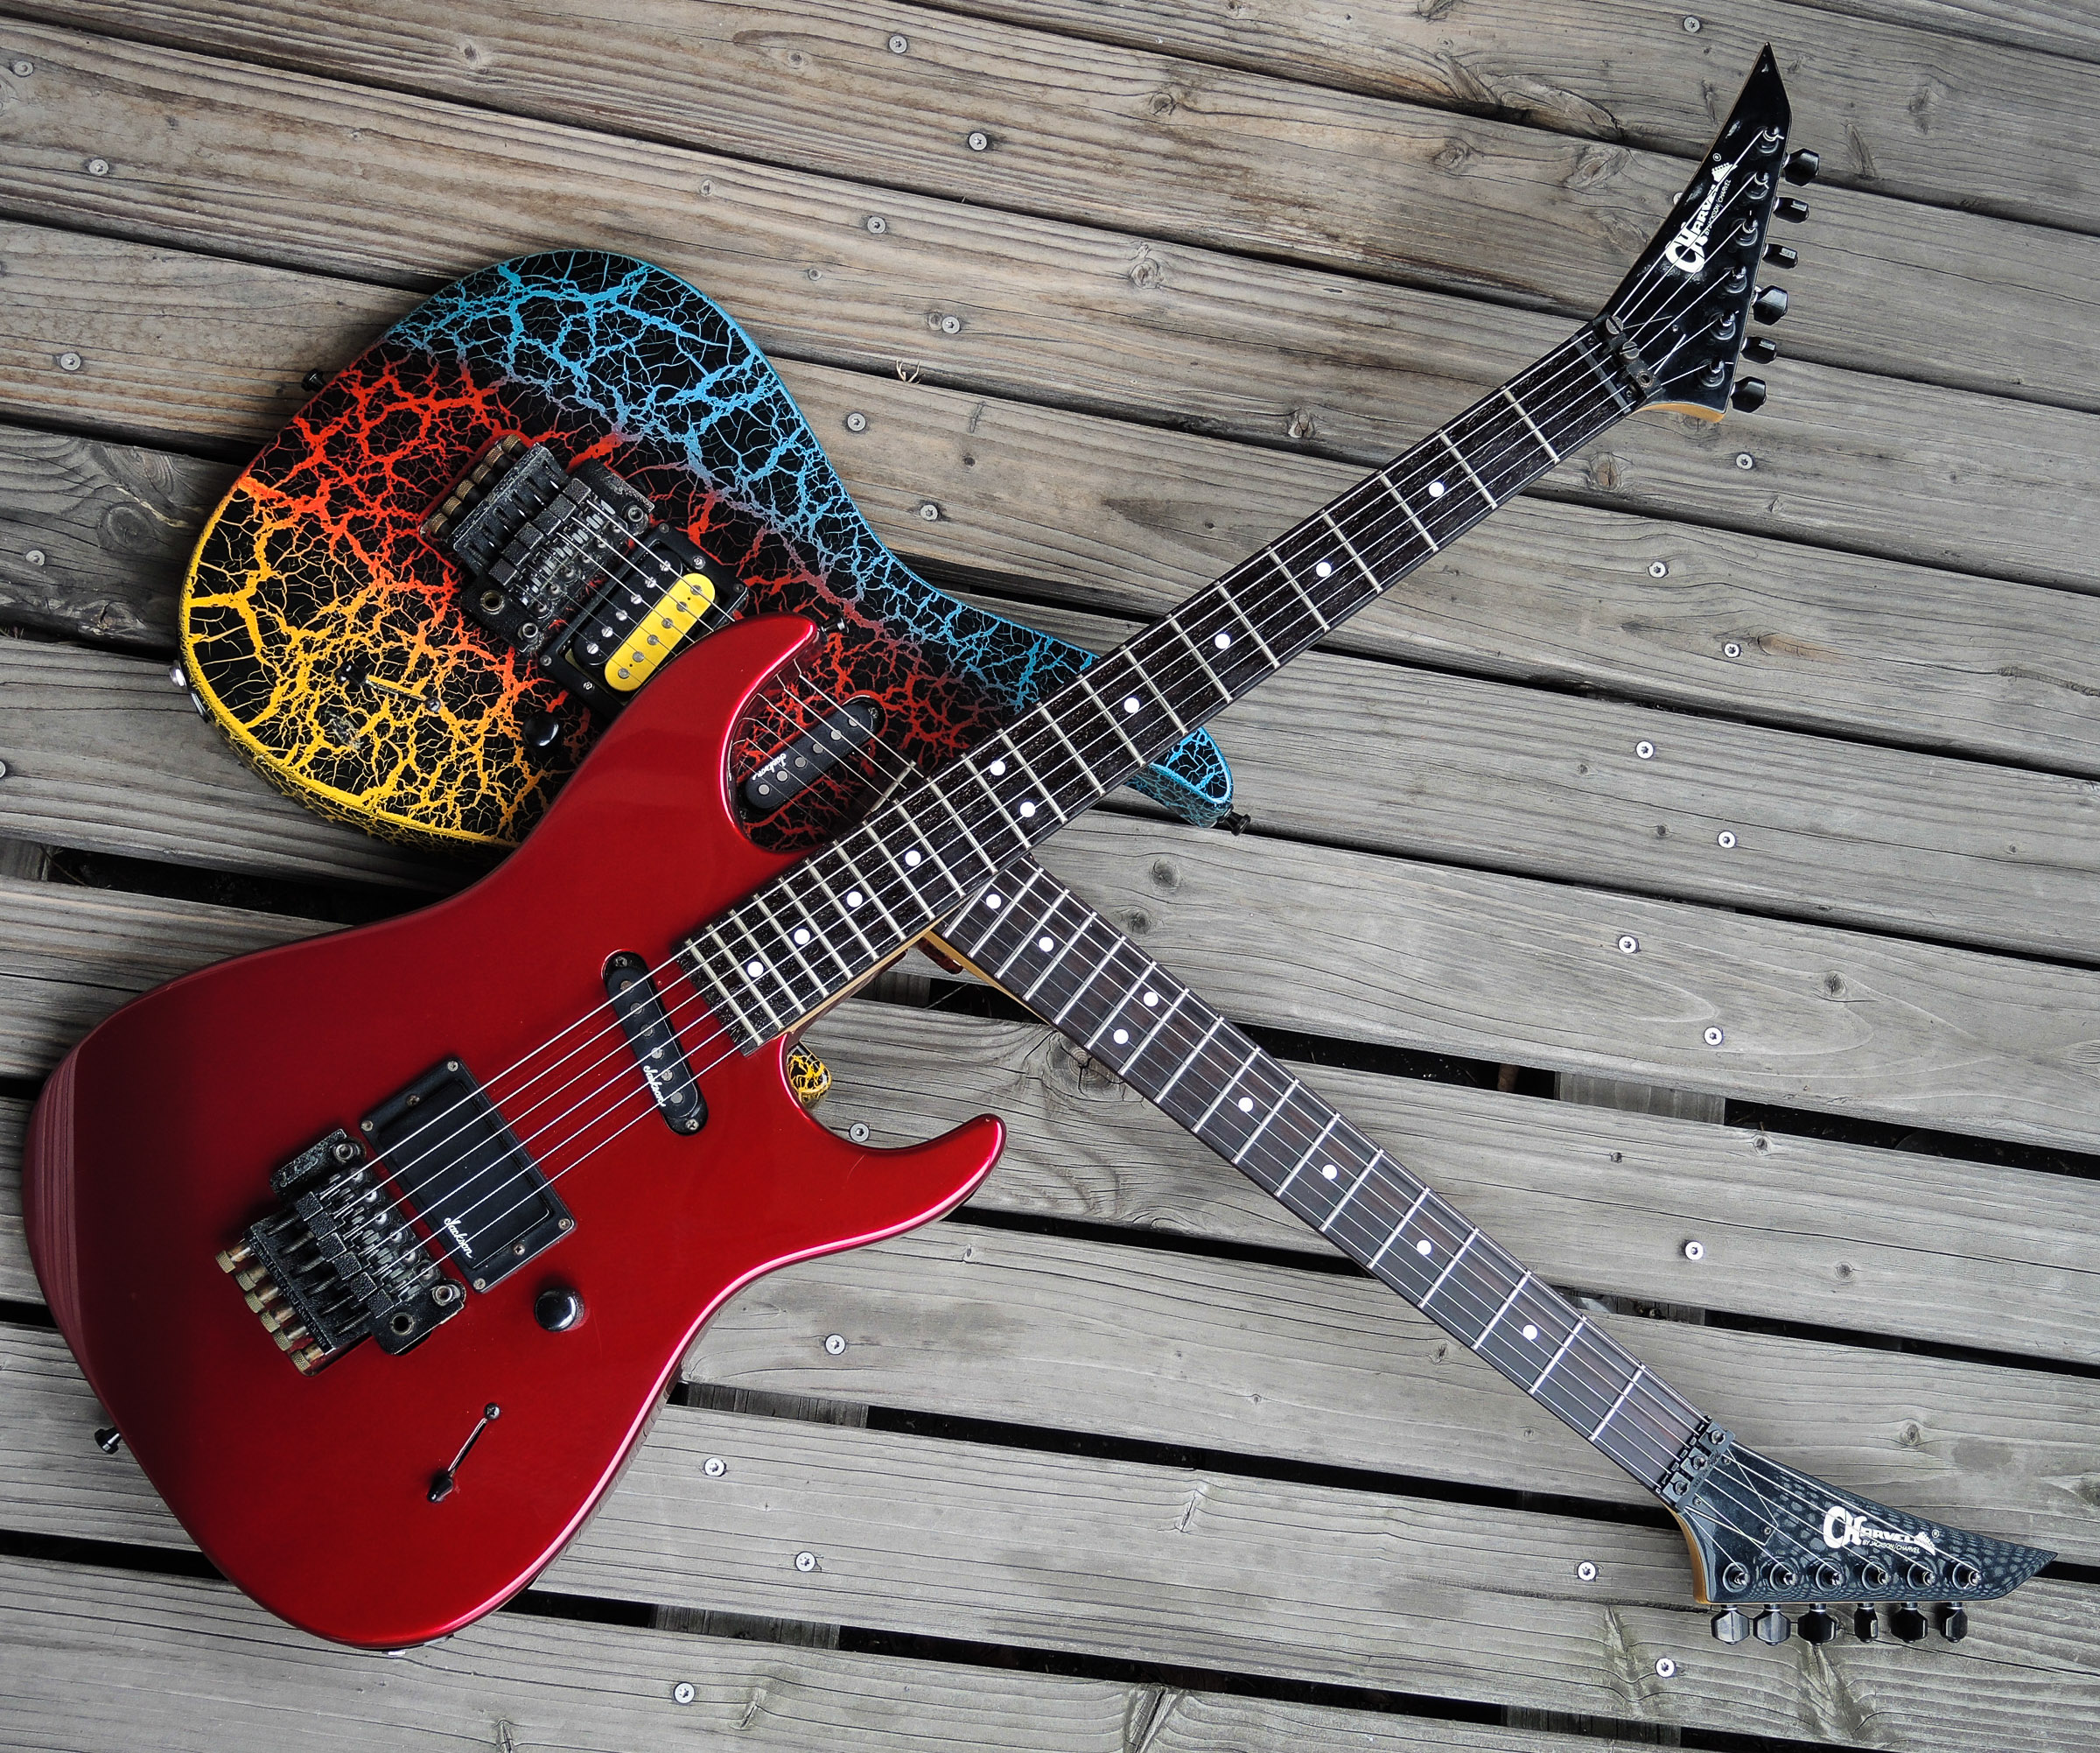 1980s Charvel Guitars